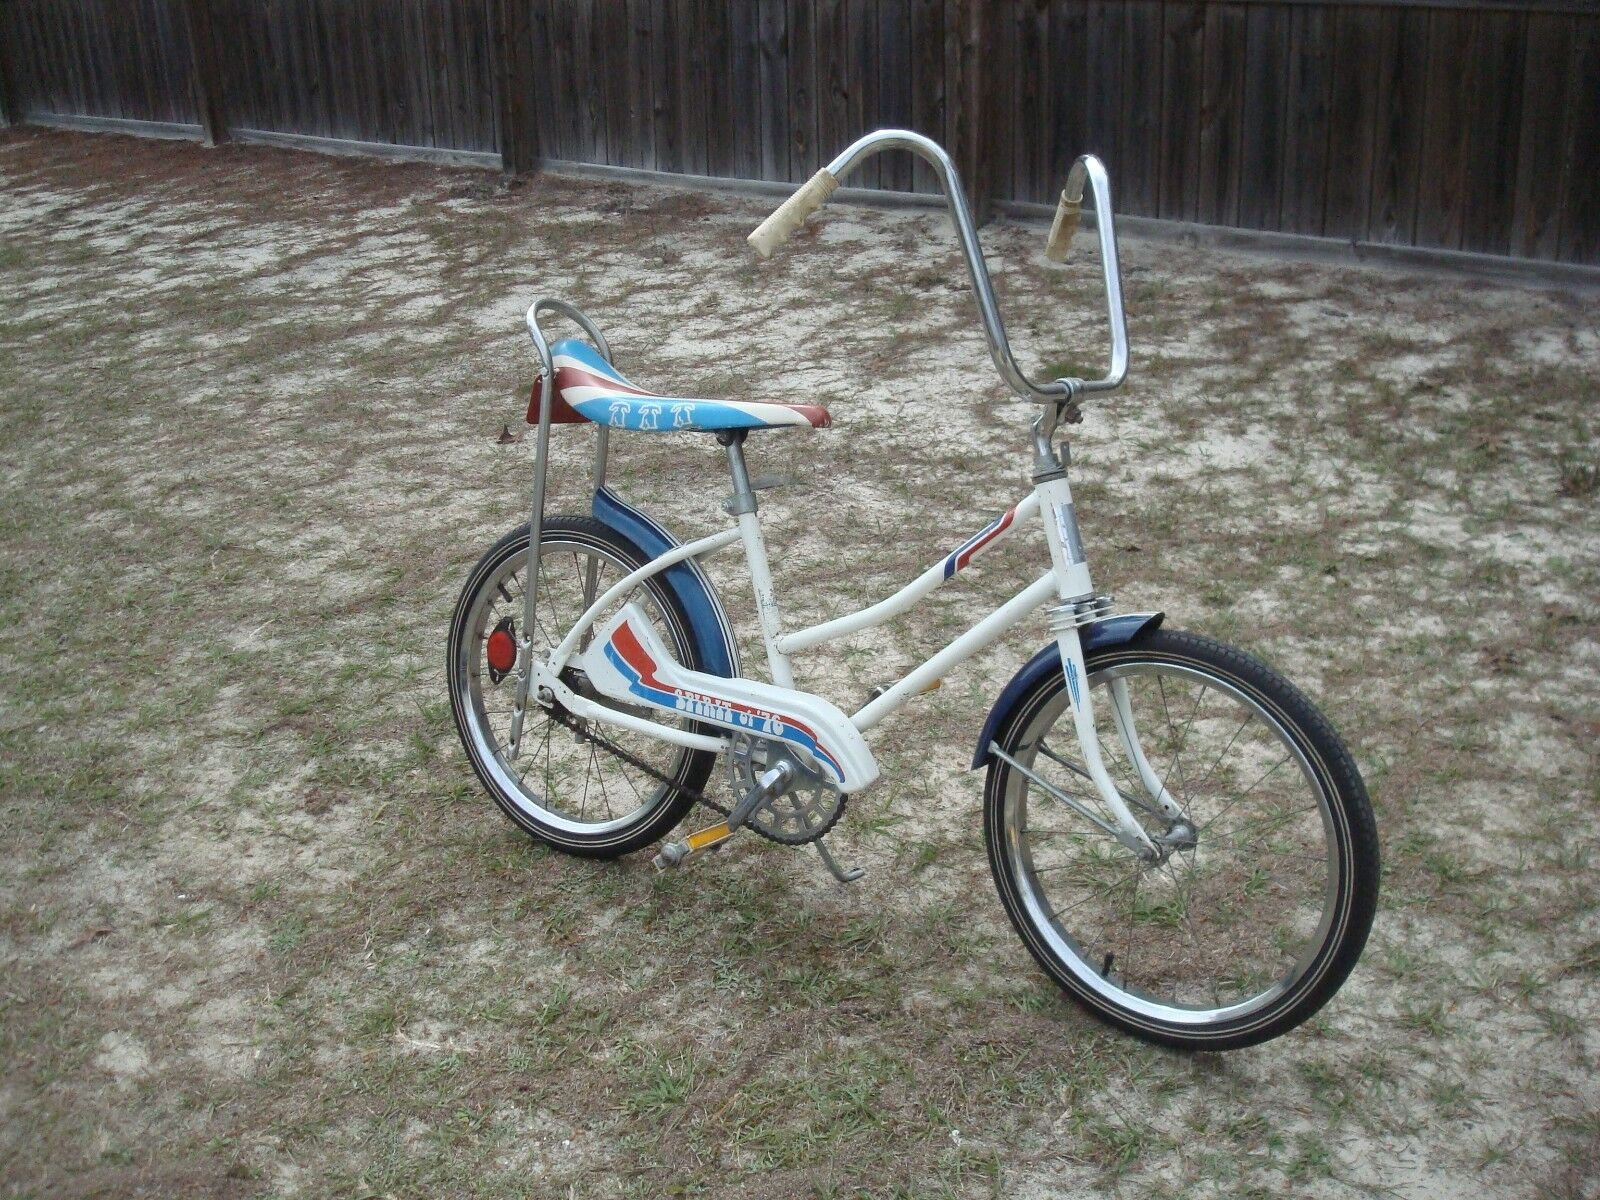 Bike   Vintage 1976 Spirit Of 76  discount low price